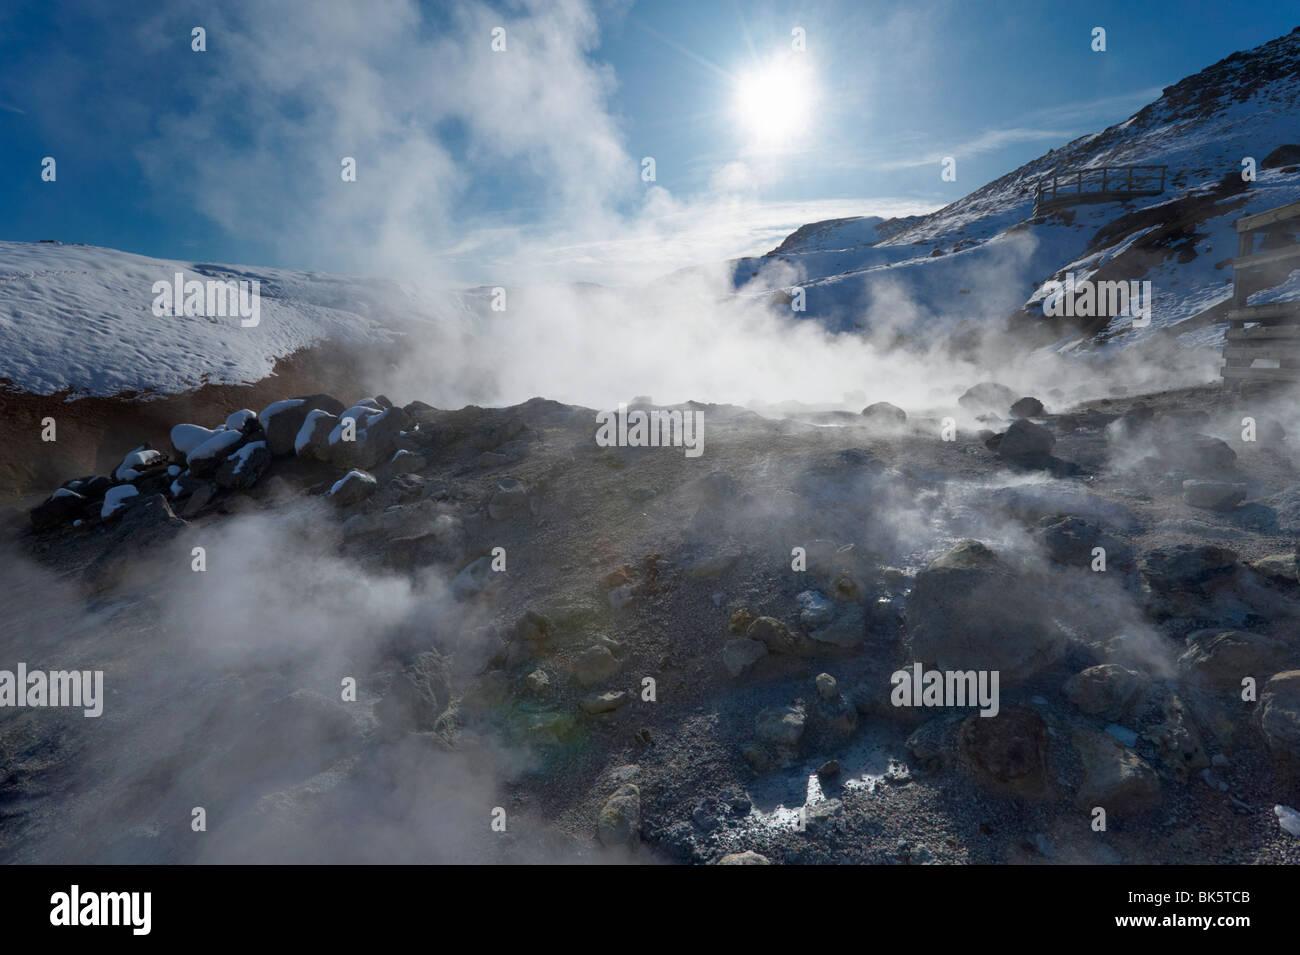 Geothermal activity of mudpots, hot springs and fumaroles, at Krisuvik (Krysuvik-Seltun), Reykjanes Peninsula, Iceland - Stock Image